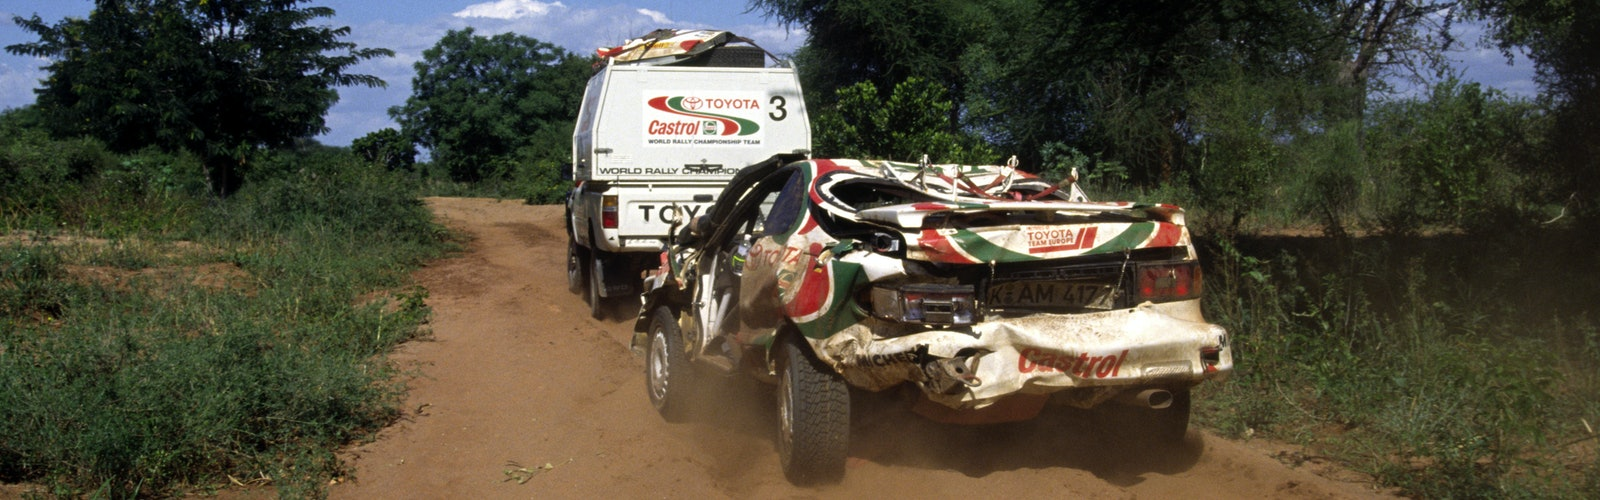 Juha Kankkunen / Nicky Grist – Toyota Team Europe Celica – 1994 WRC Safari Rally